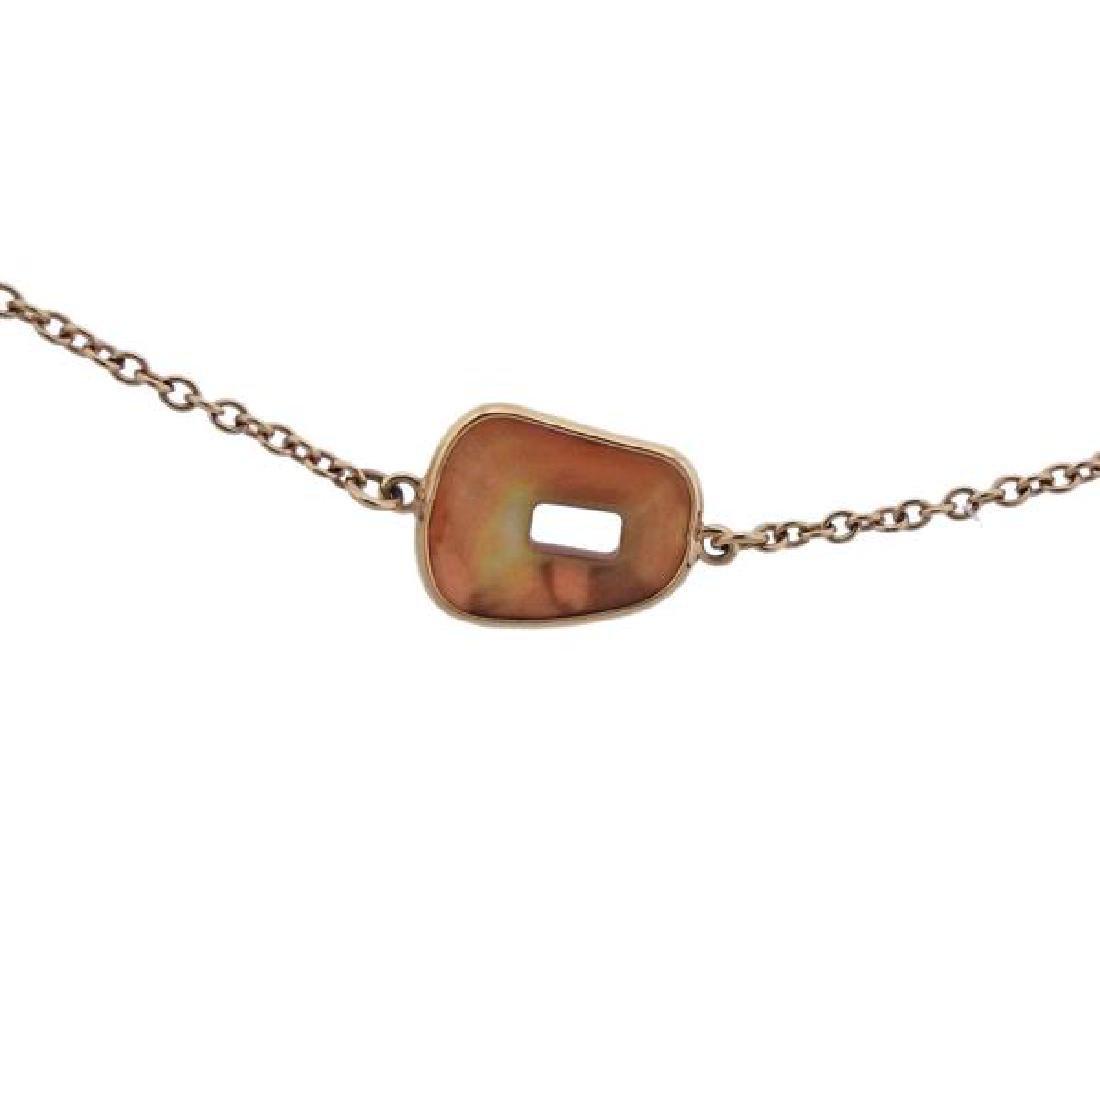 Mattioli 18K Gold Orange MOP Station Necklace - 2